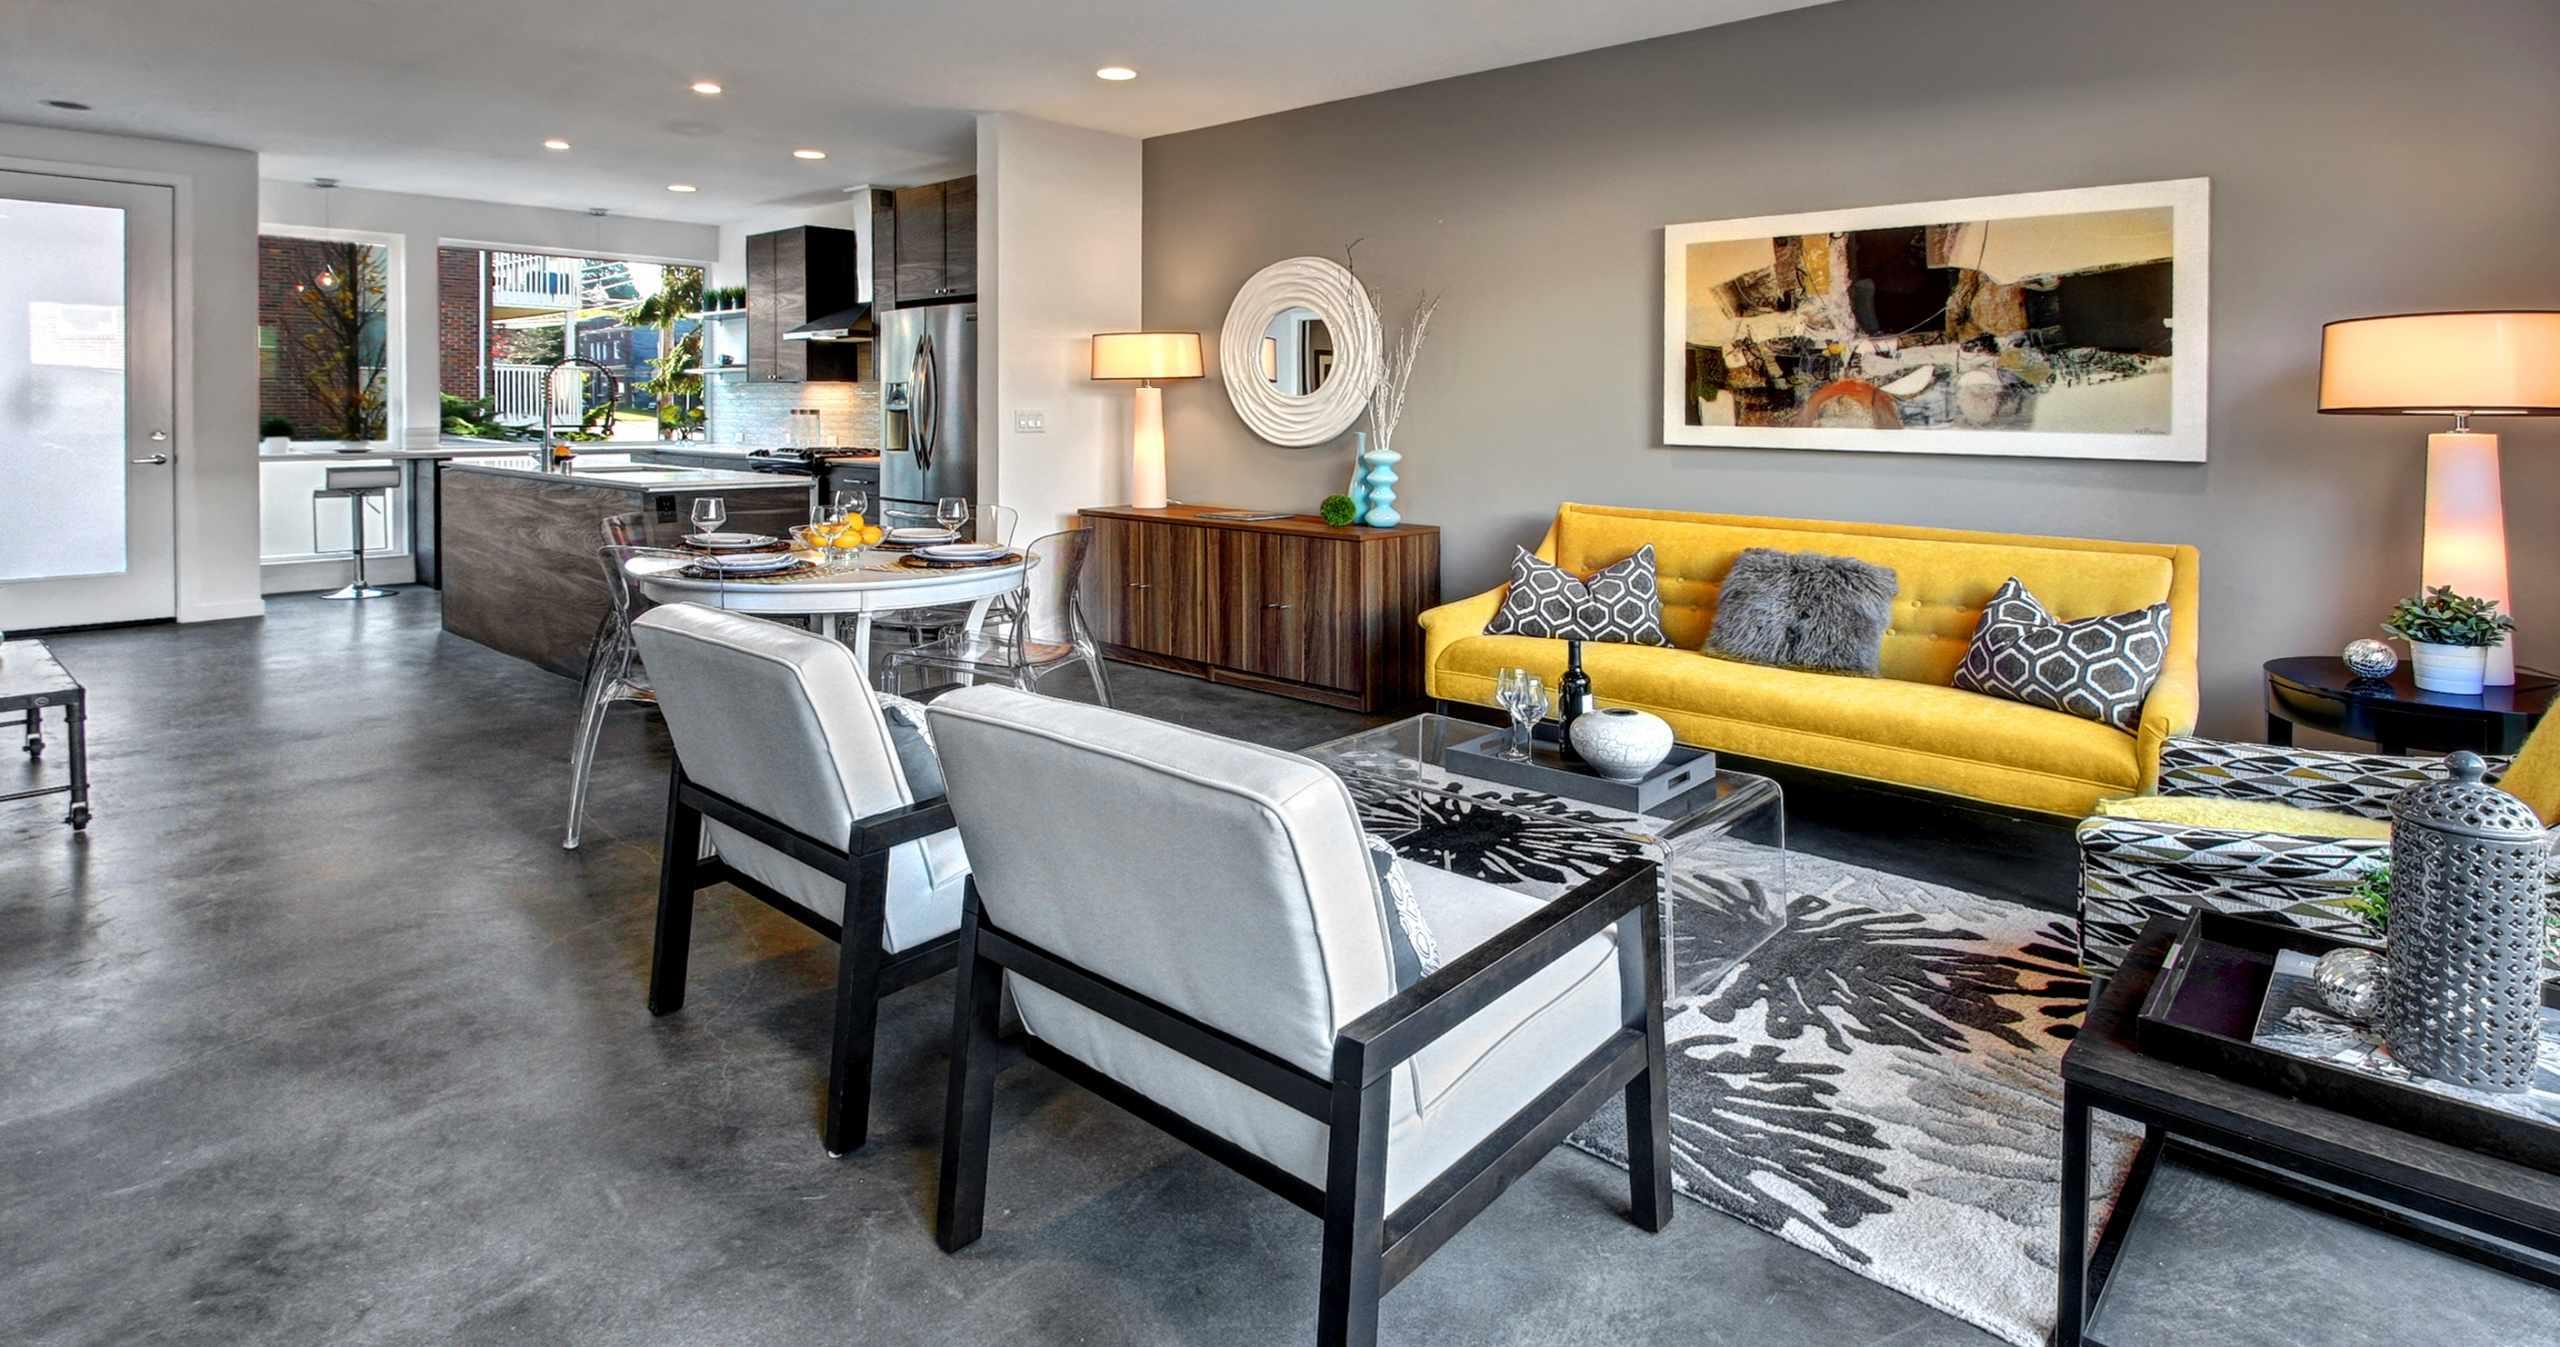 Isola Homes brings you Morgan 5.1, Isola Homes, Modern, Concrete Floors